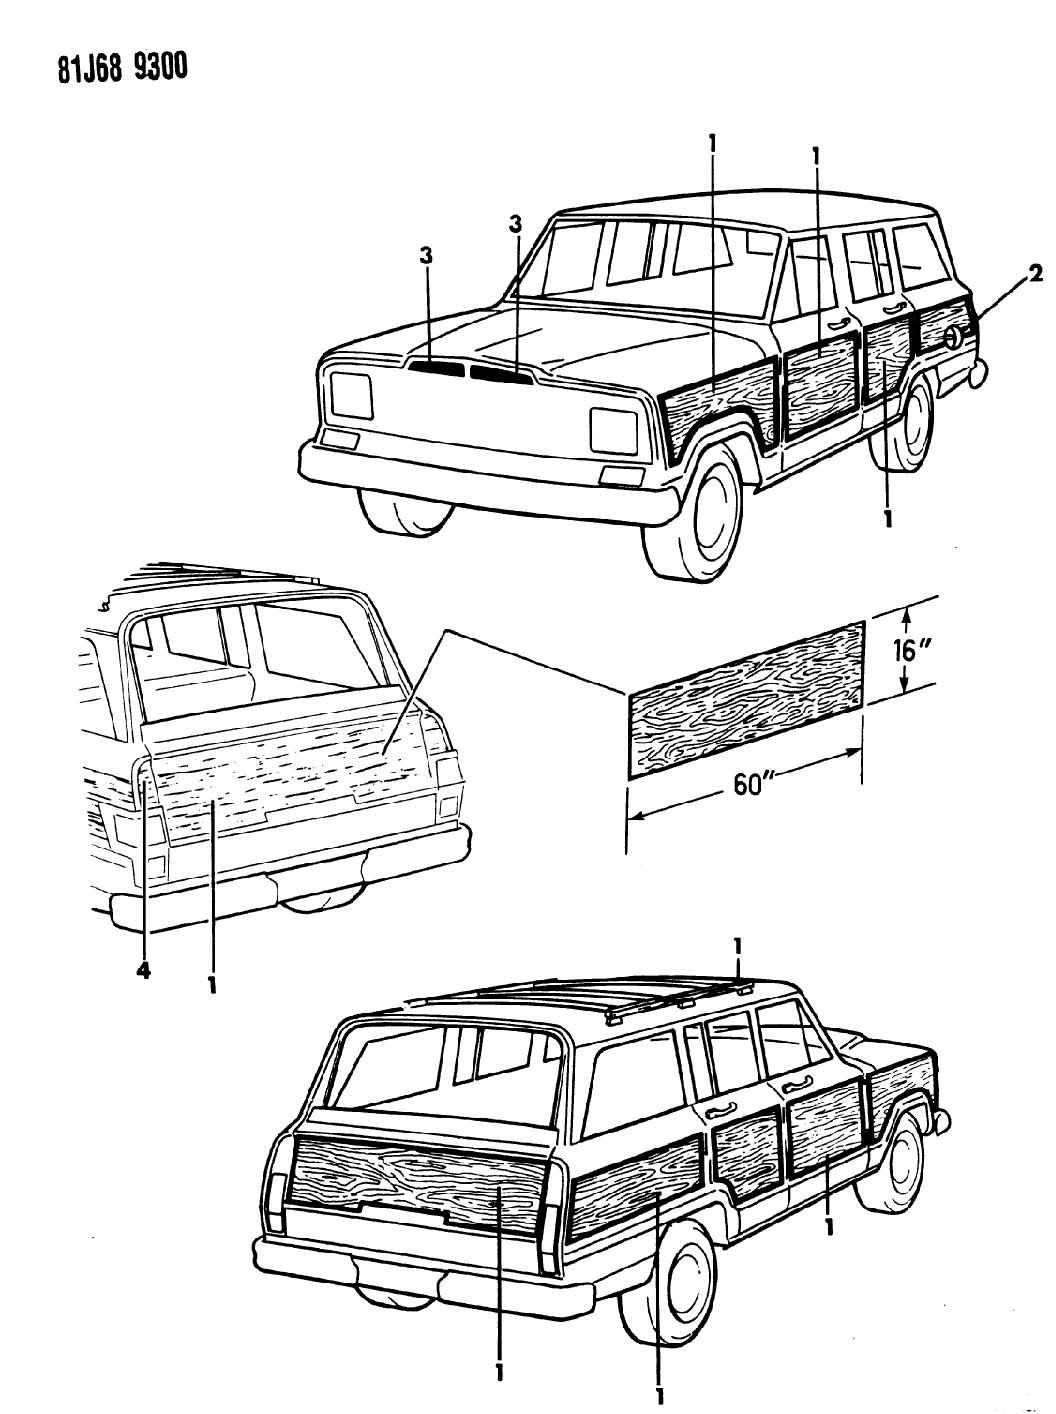 Jeep Grand Wagoneer Decals Exterior Woodgrain Sj